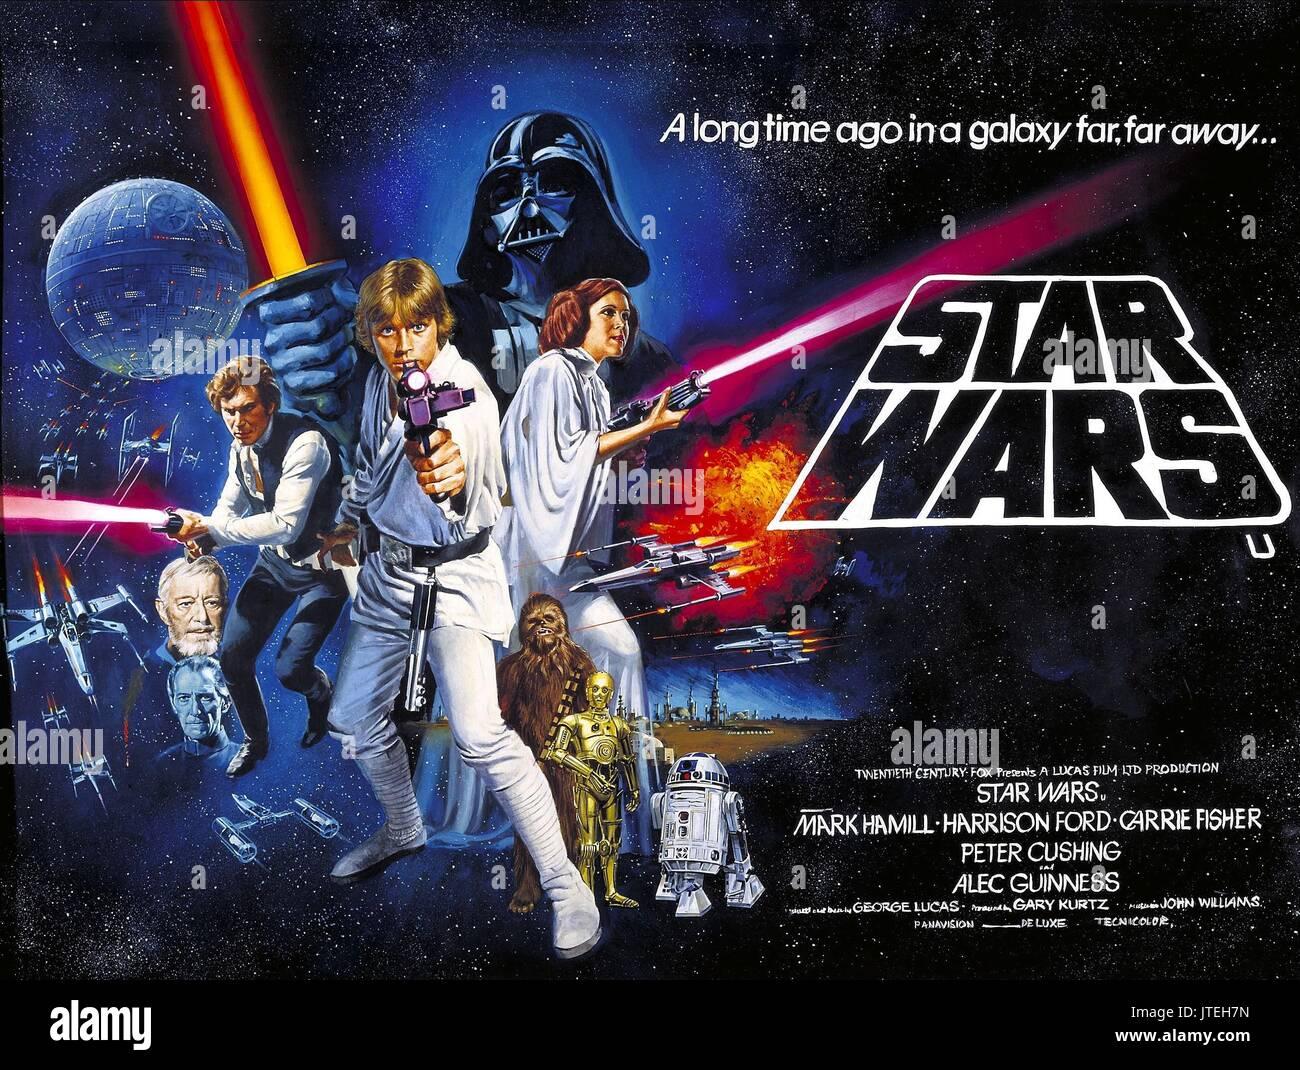 film poster star wars star wars